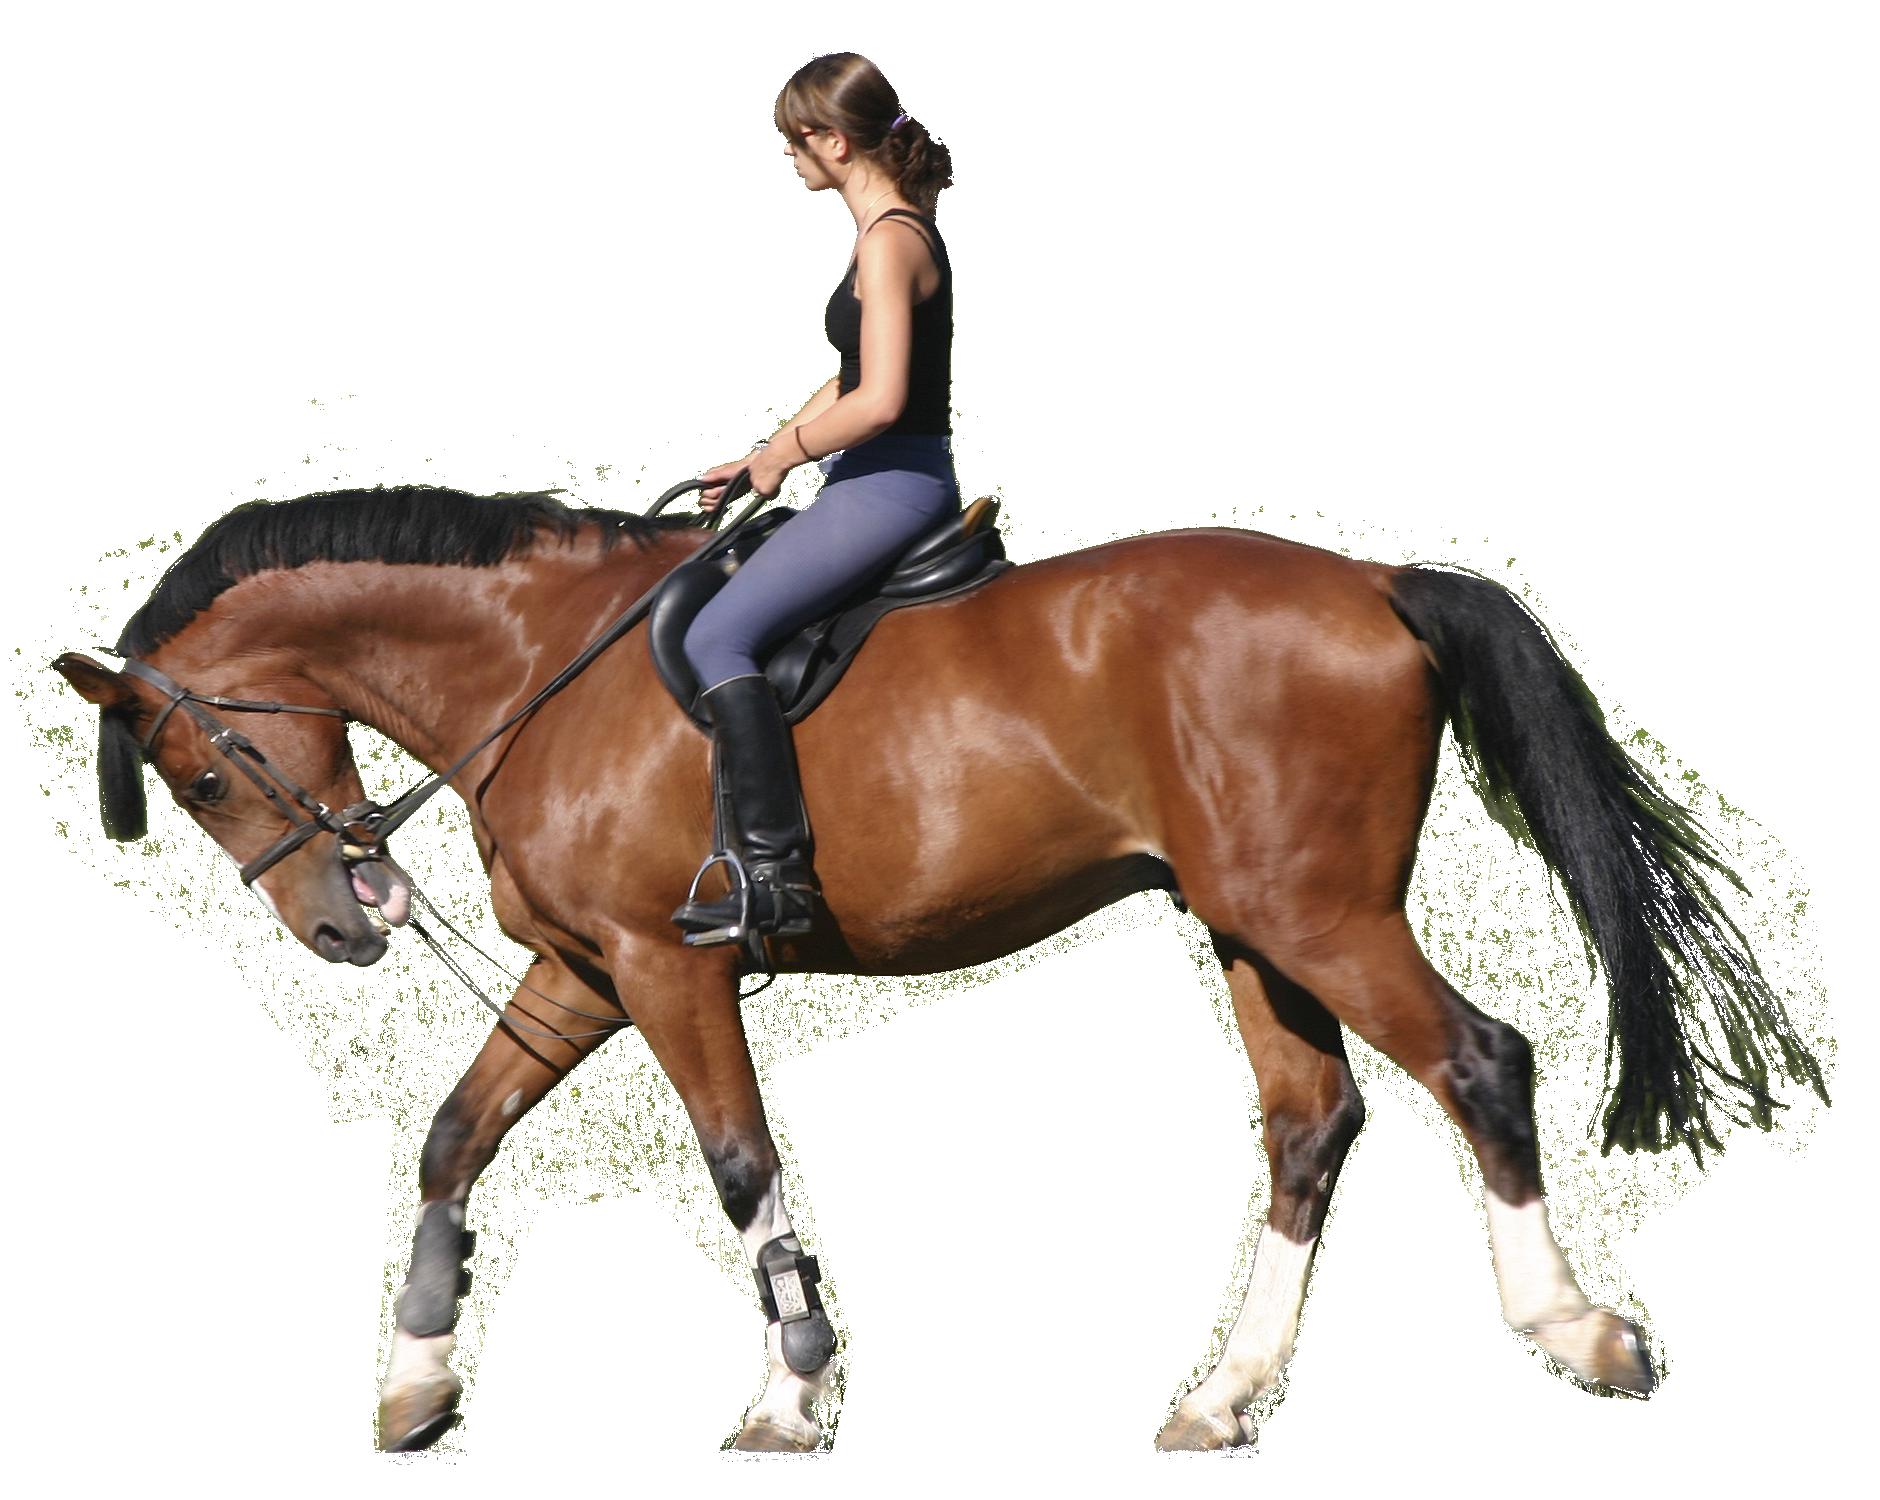 Horseback.png (1880×1500)